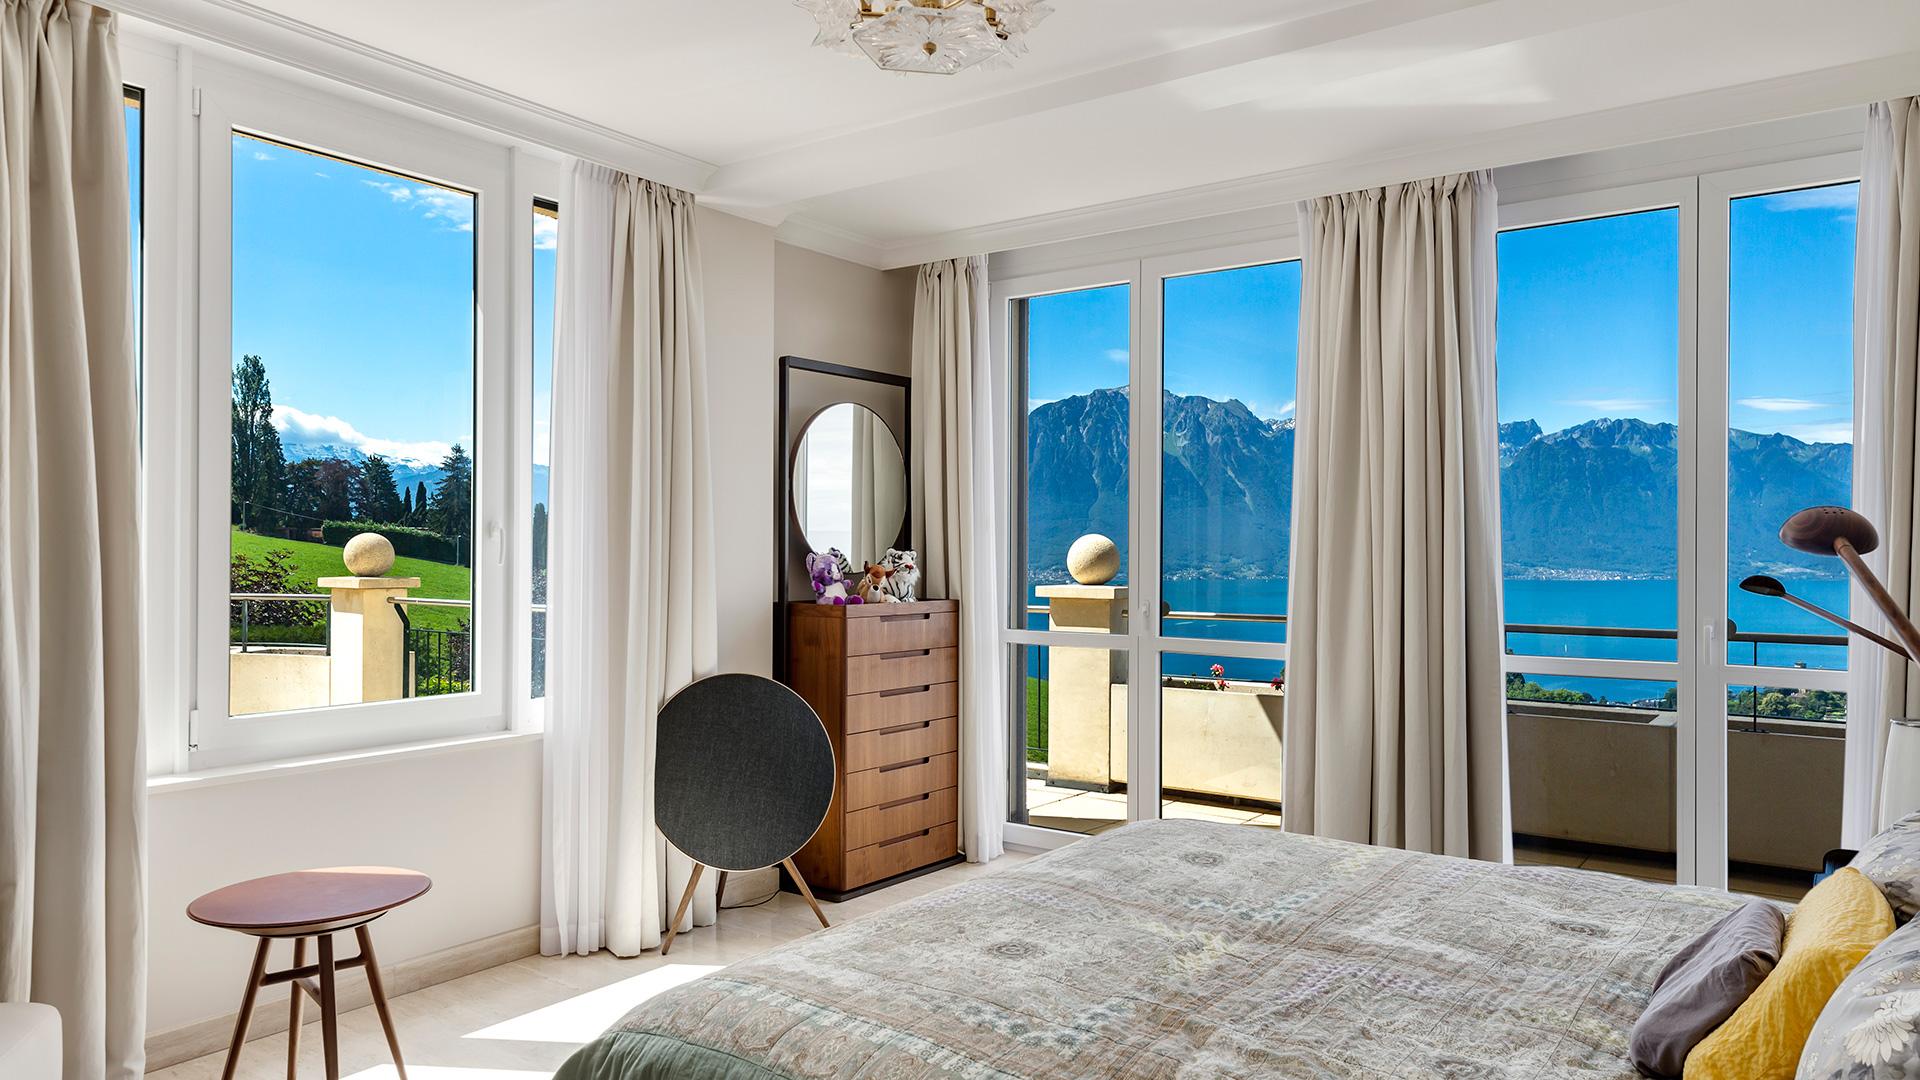 Fresey Apt Apartments, Switzerland